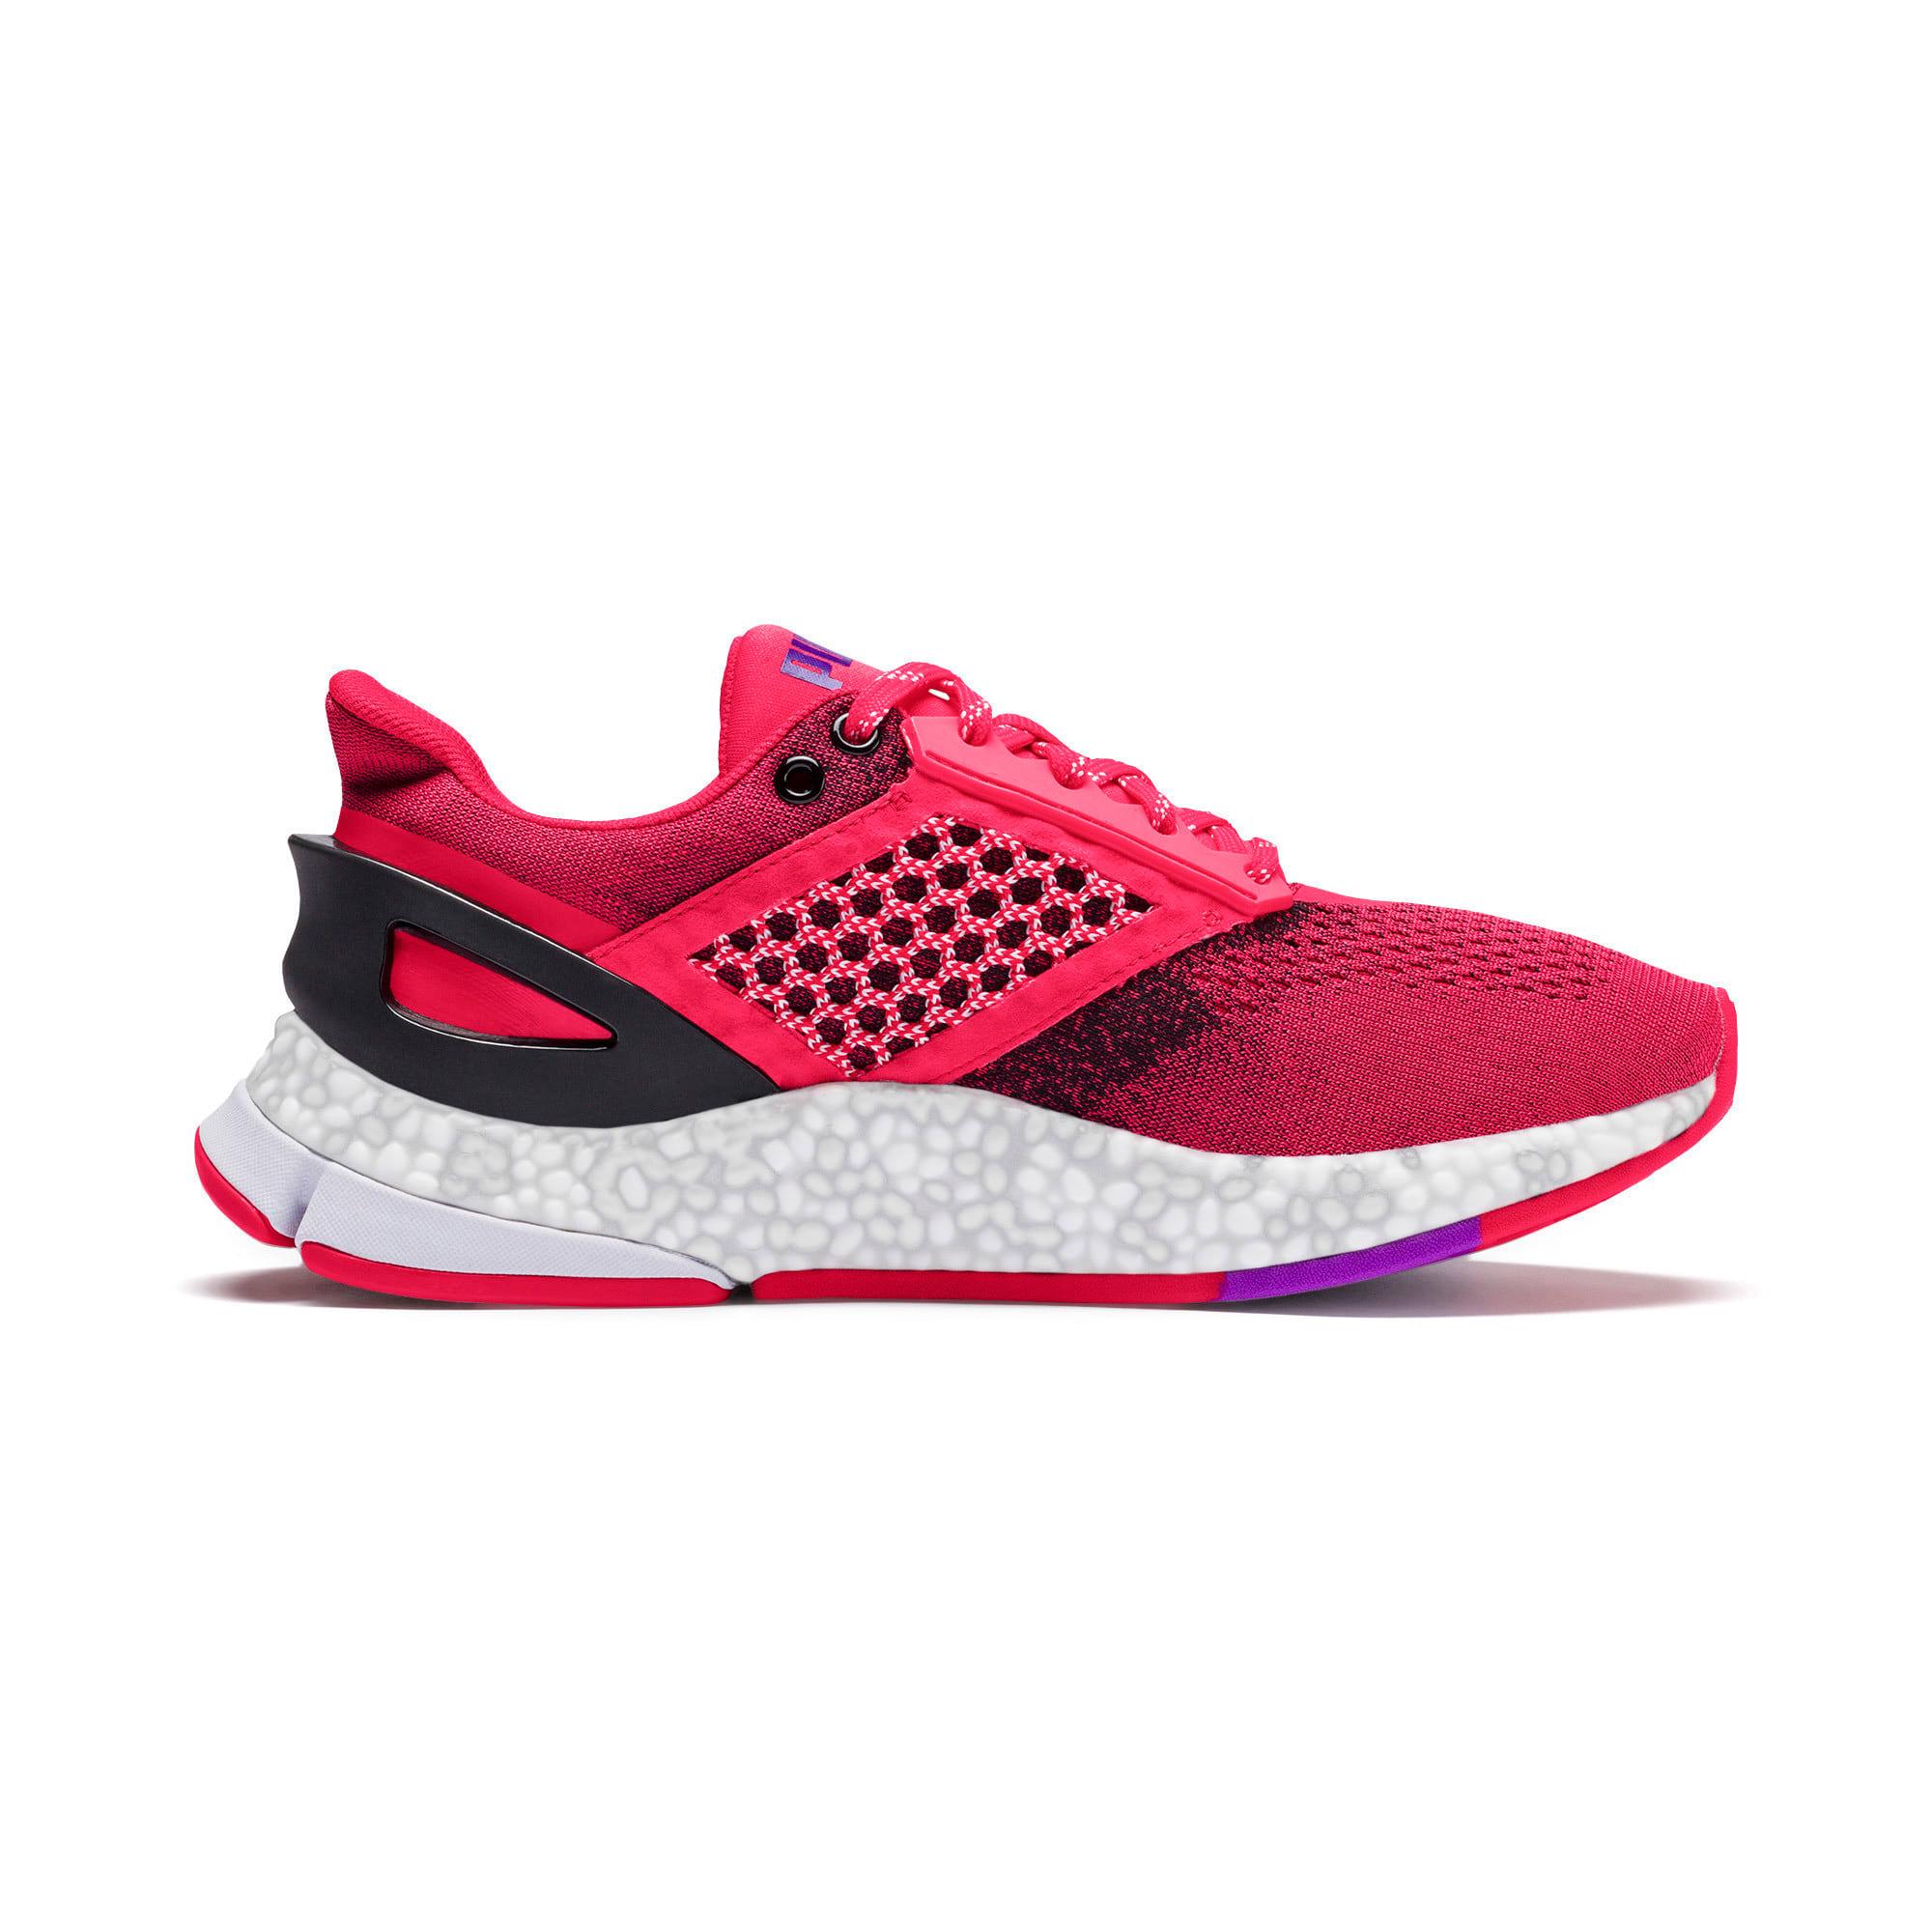 Thumbnail 8 of HYBRID Astro Women's Running Shoes, Nrgy Rose-Puma Black, medium